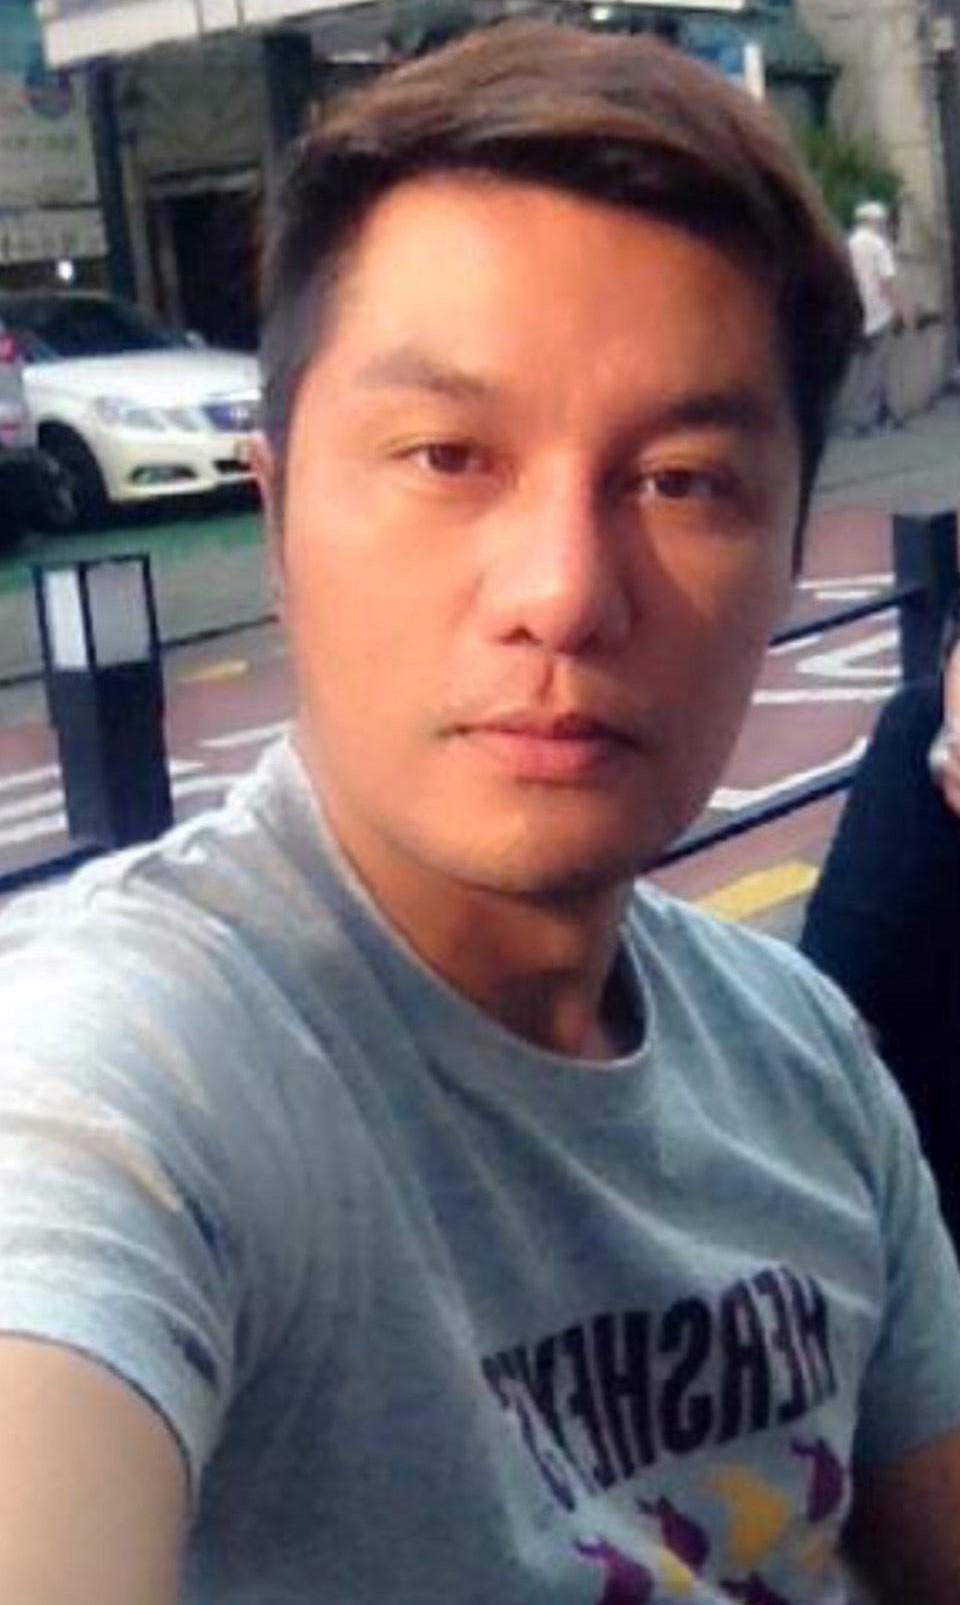 NU, Korean/English/Laos